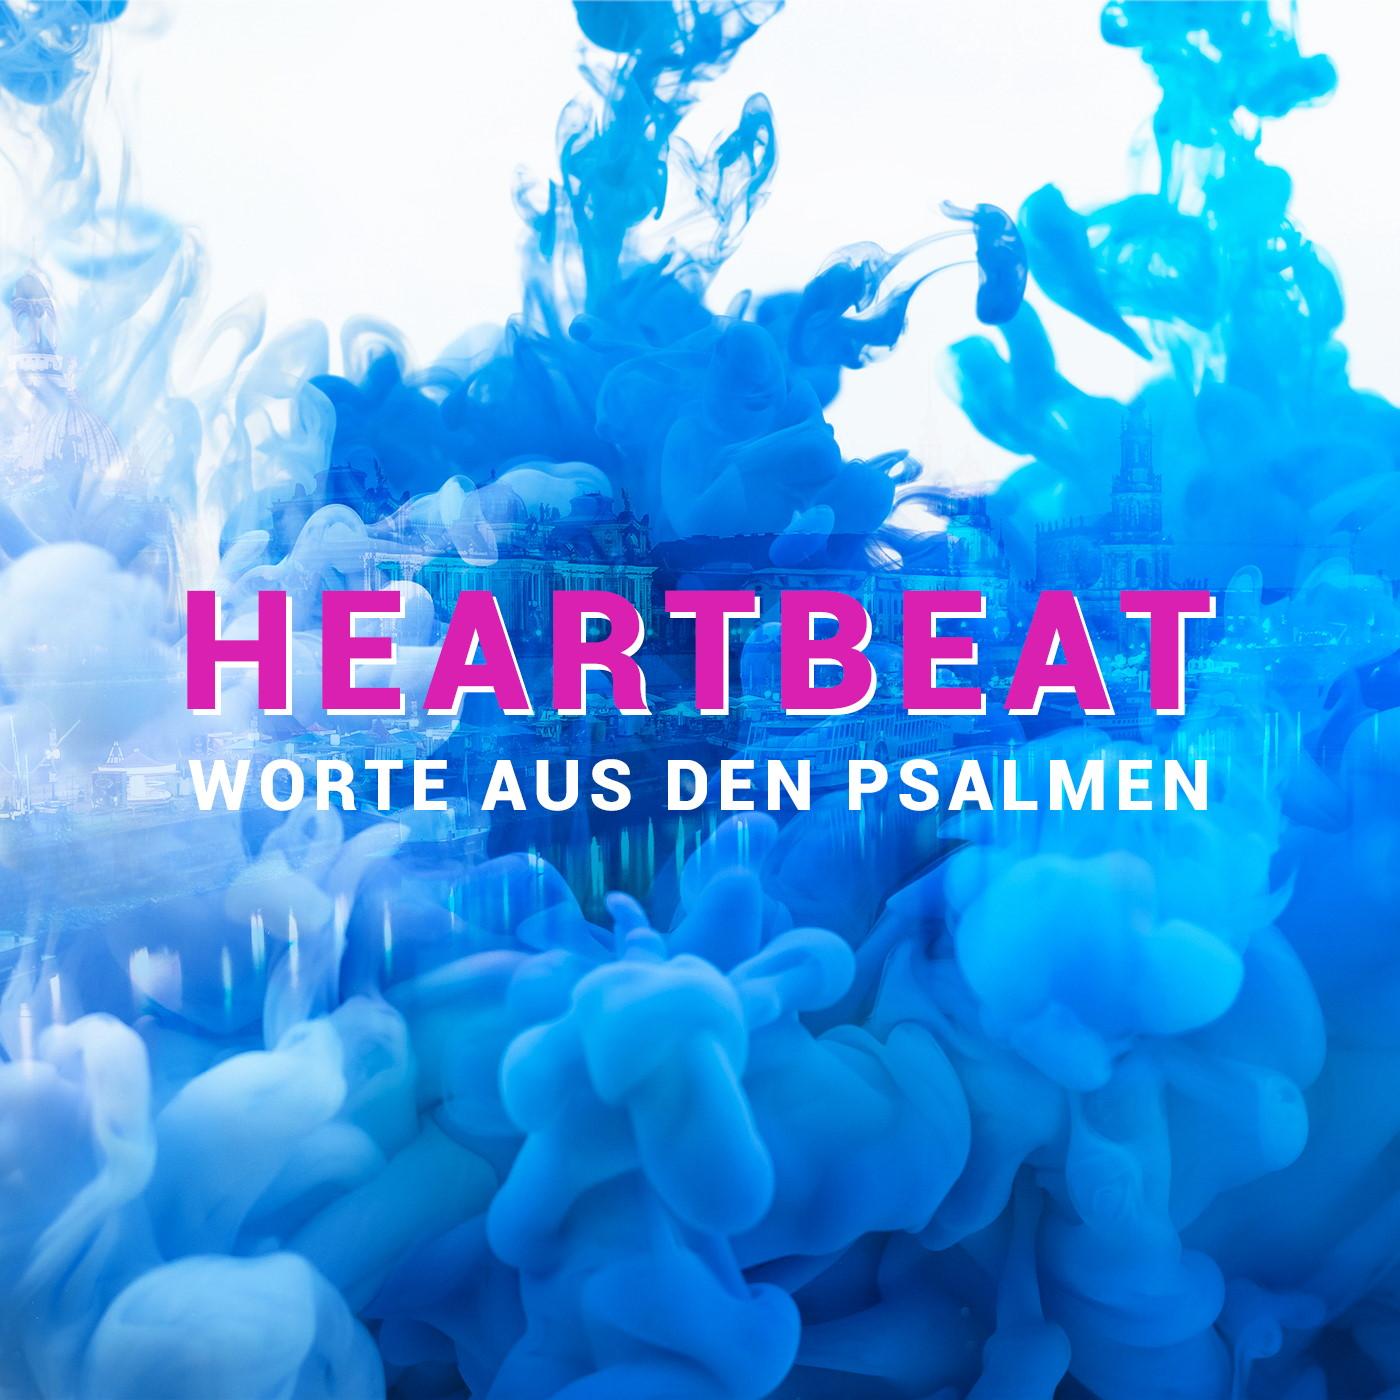 Heartbeat - Worte aus den Psalmen Teil 5 [video]